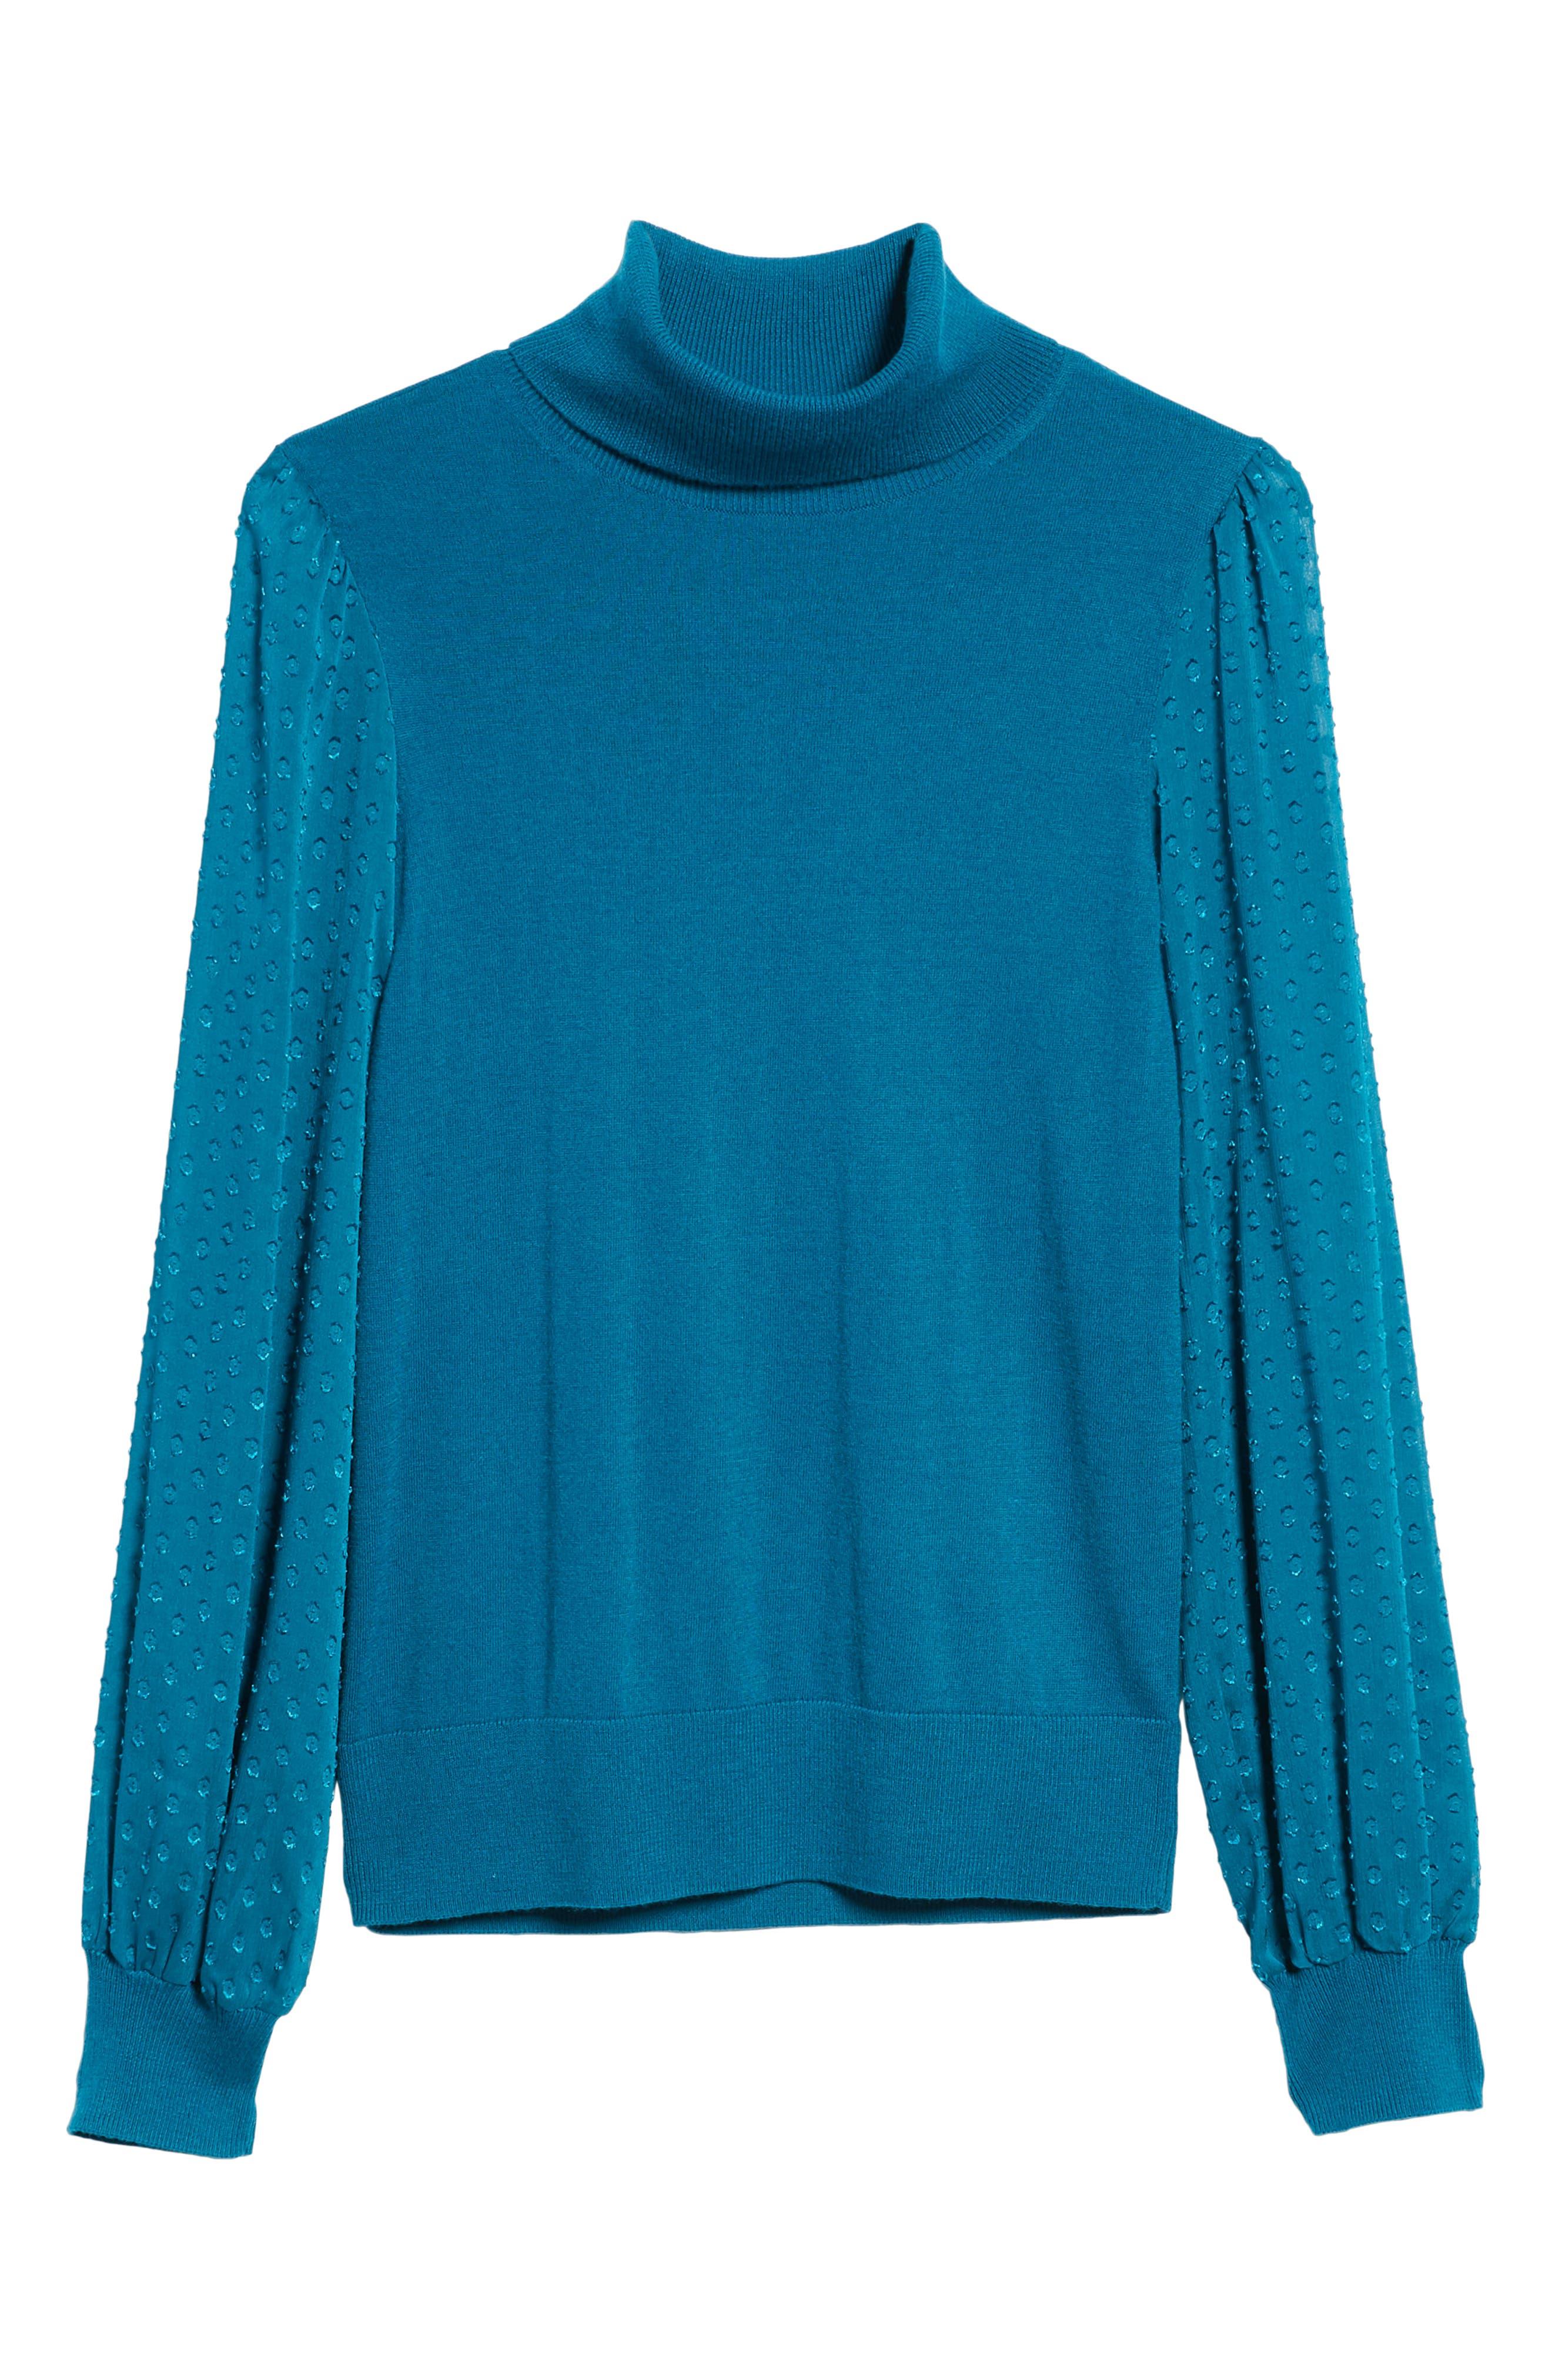 Sheer Sleeve Turtleneck Sweater,                             Alternate thumbnail 6, color,                             449